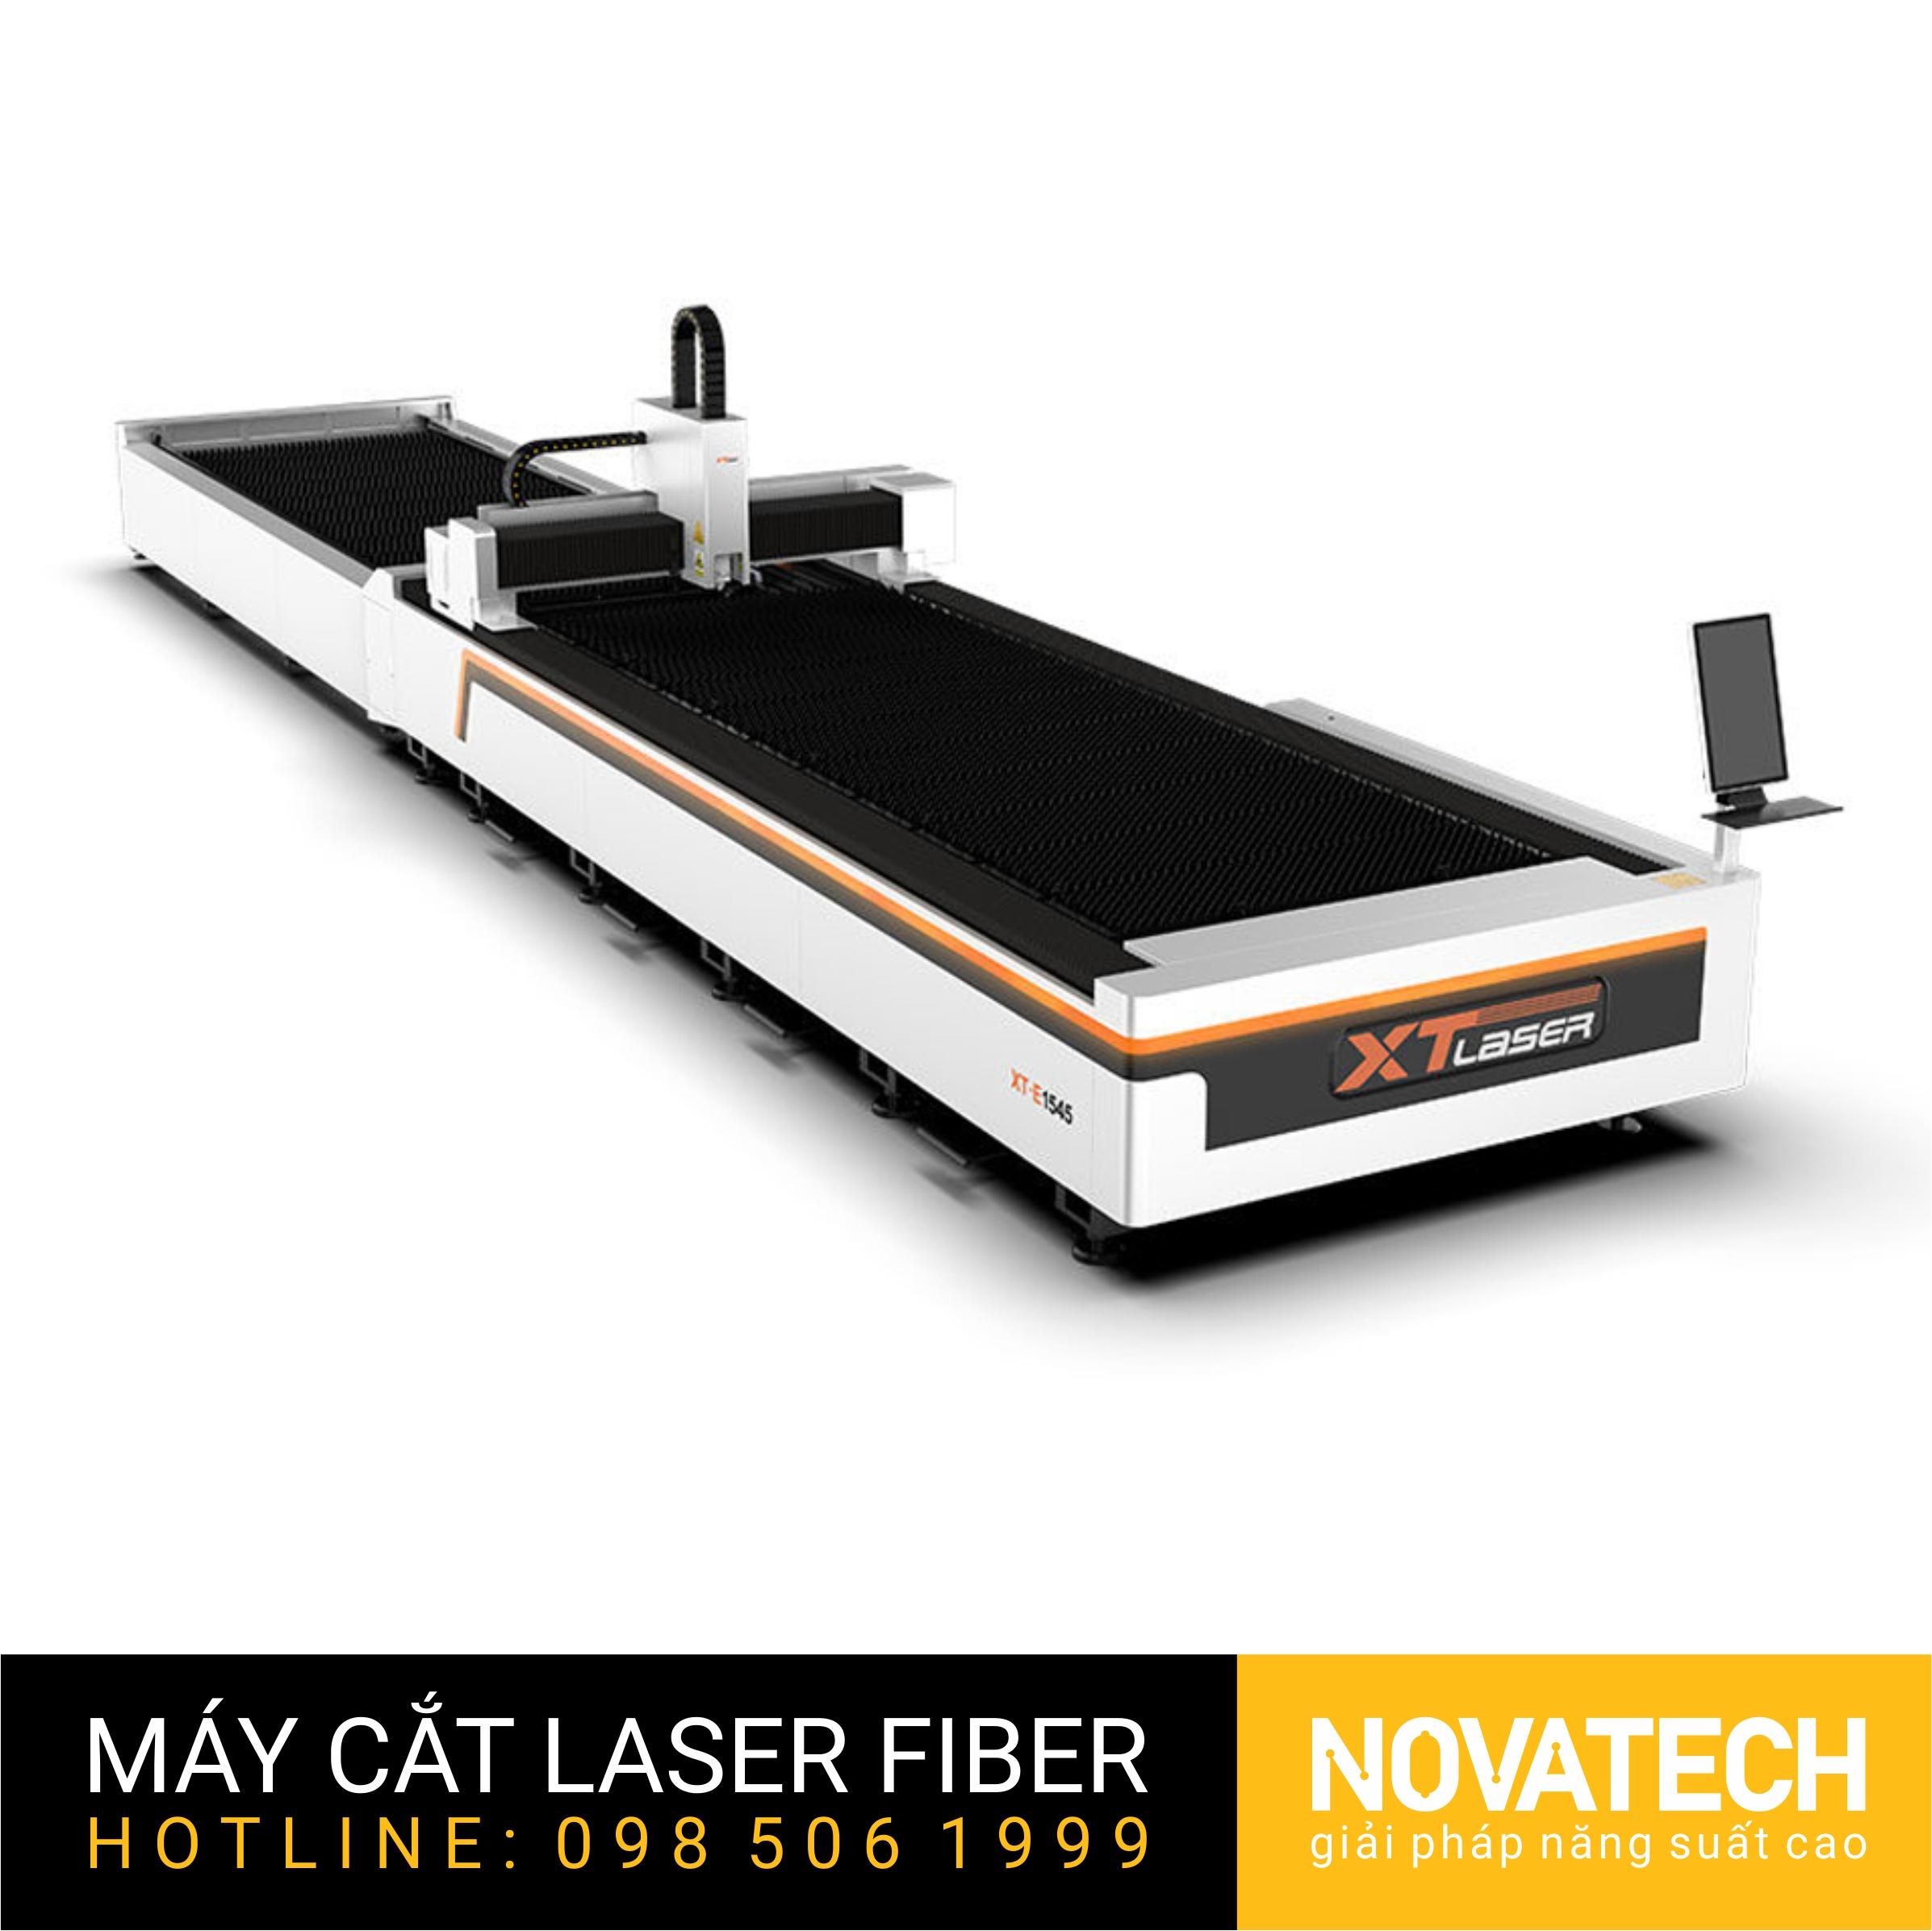 Máy cắt laser fiber bàn đôi XT-Laser E Series